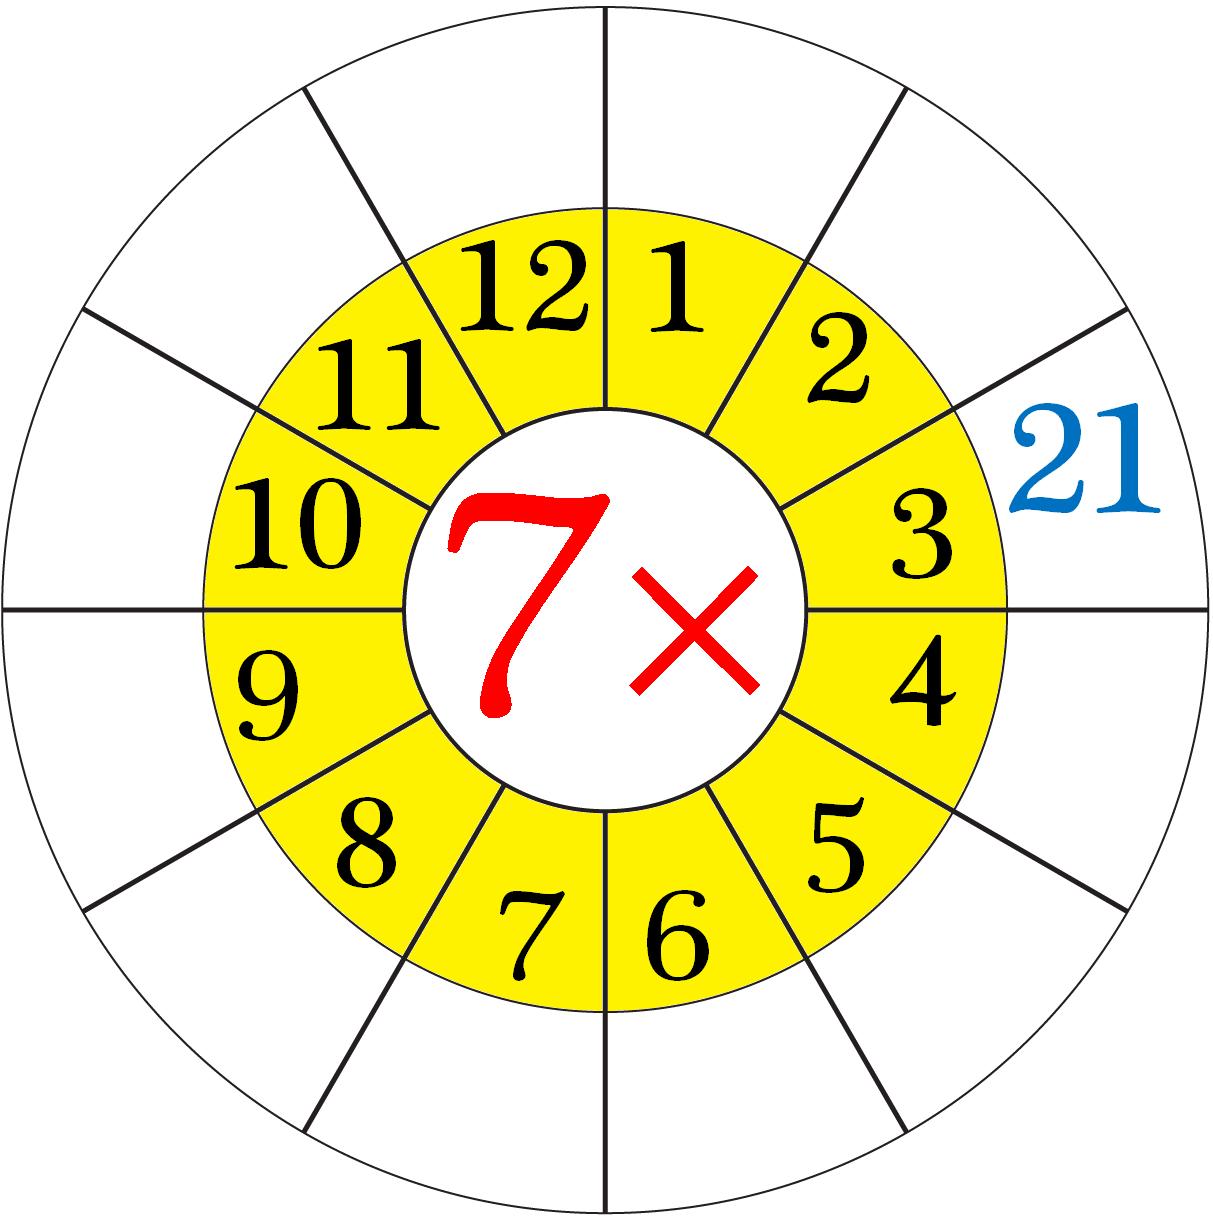 Free multiplication wheel worksheets Laminate and use Visaviss – Learning Multiplication Tables Worksheets